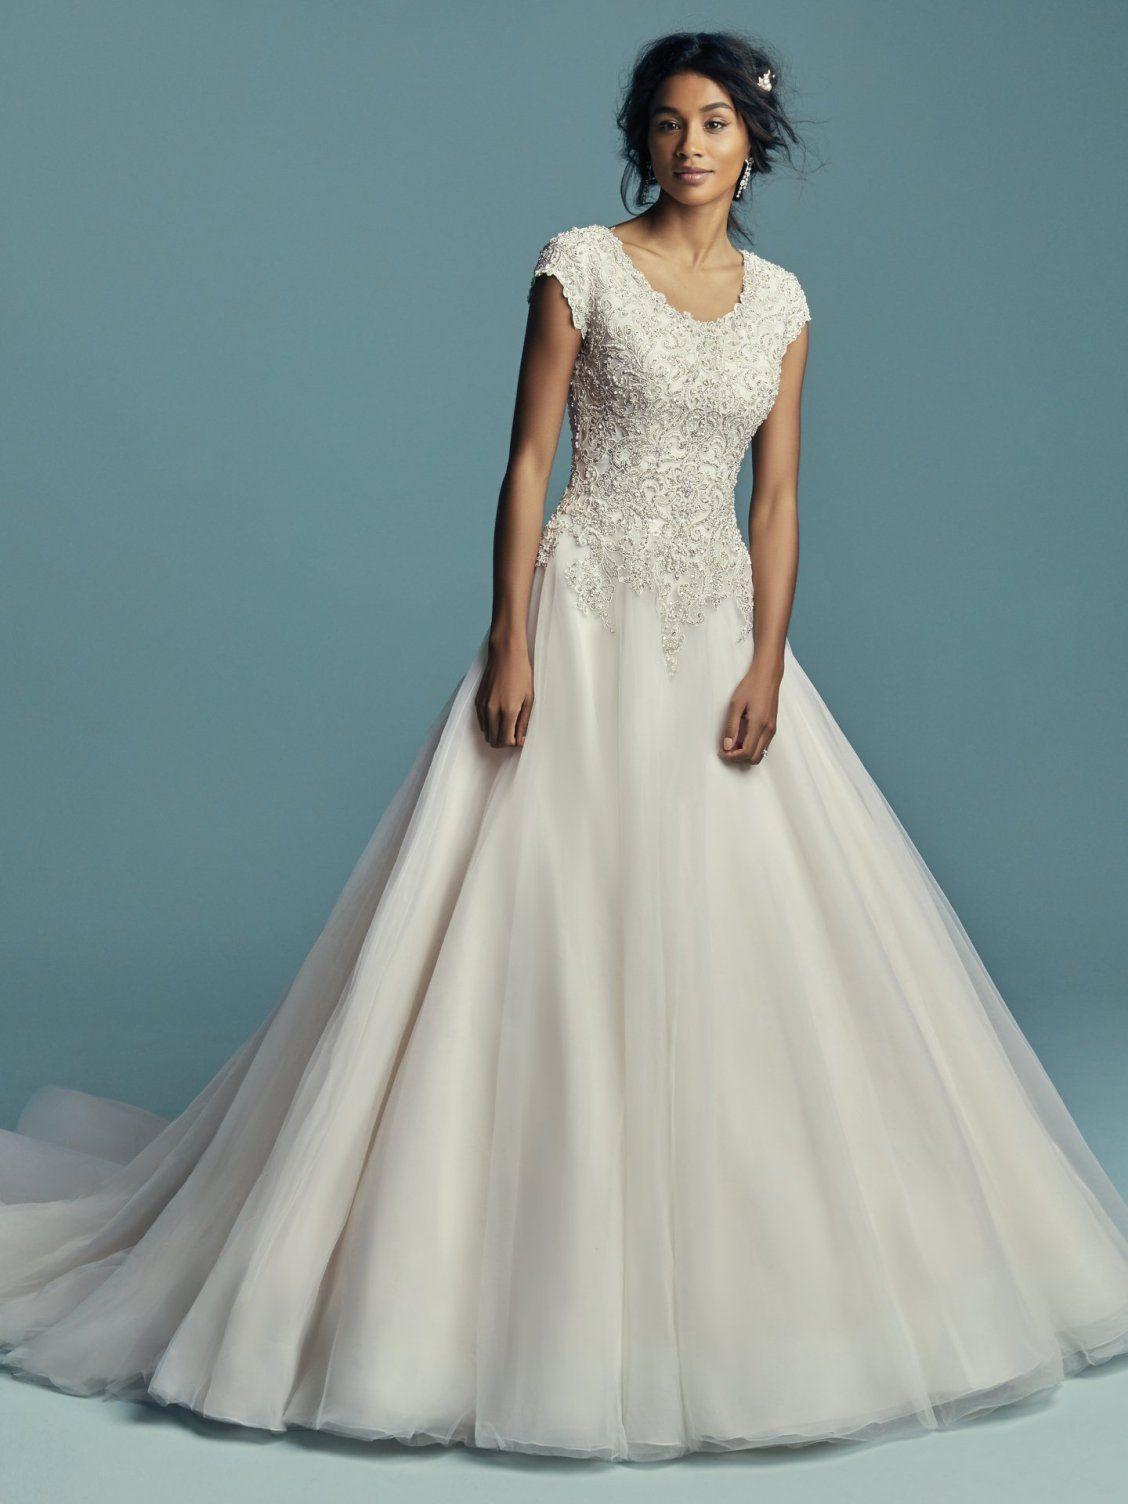 Eden Marie By Maggie Sottero Wedding Dresses Ball Gowns Wedding A Line Wedding Dress Sottero Wedding Dress